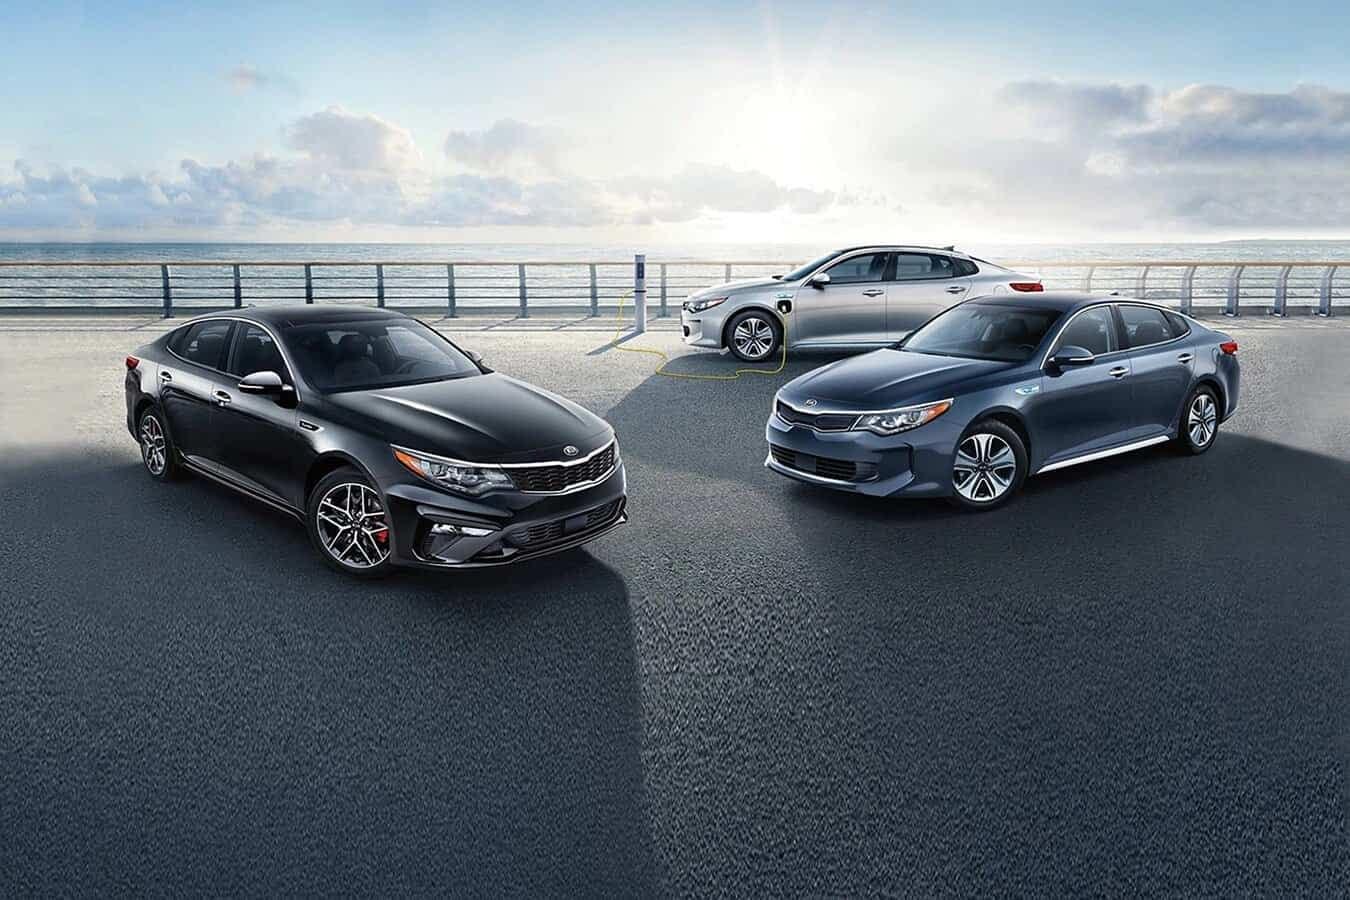 Buy a New Kia Online From Detroit MI